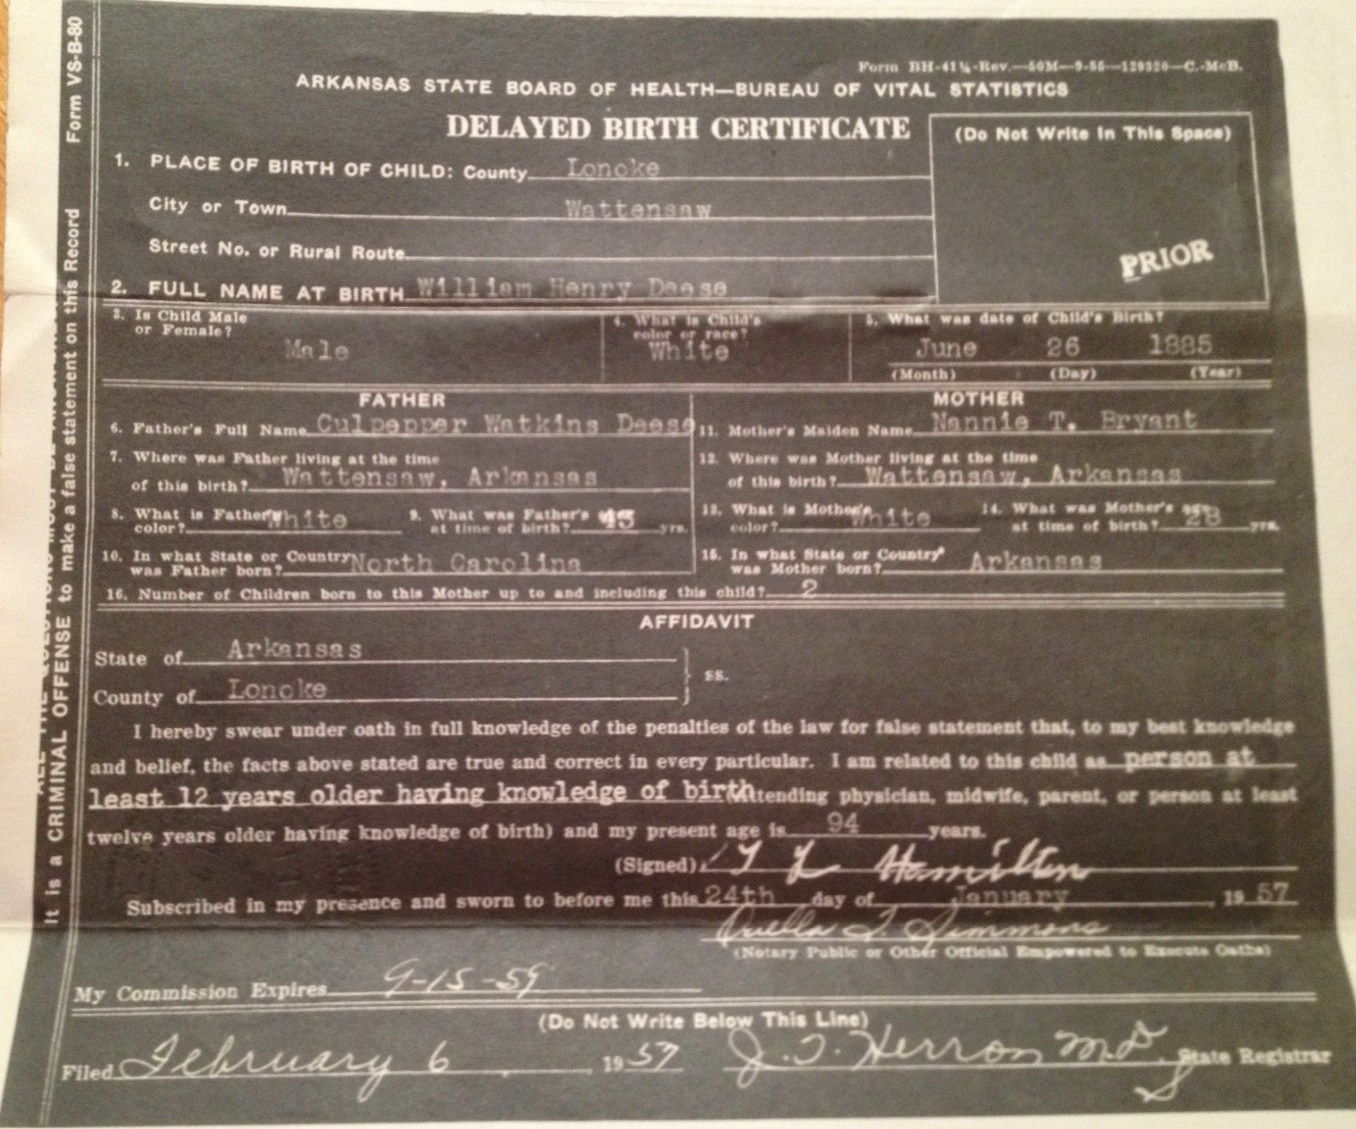 arkansas pulaski county deese death henry william certificate rock place birth